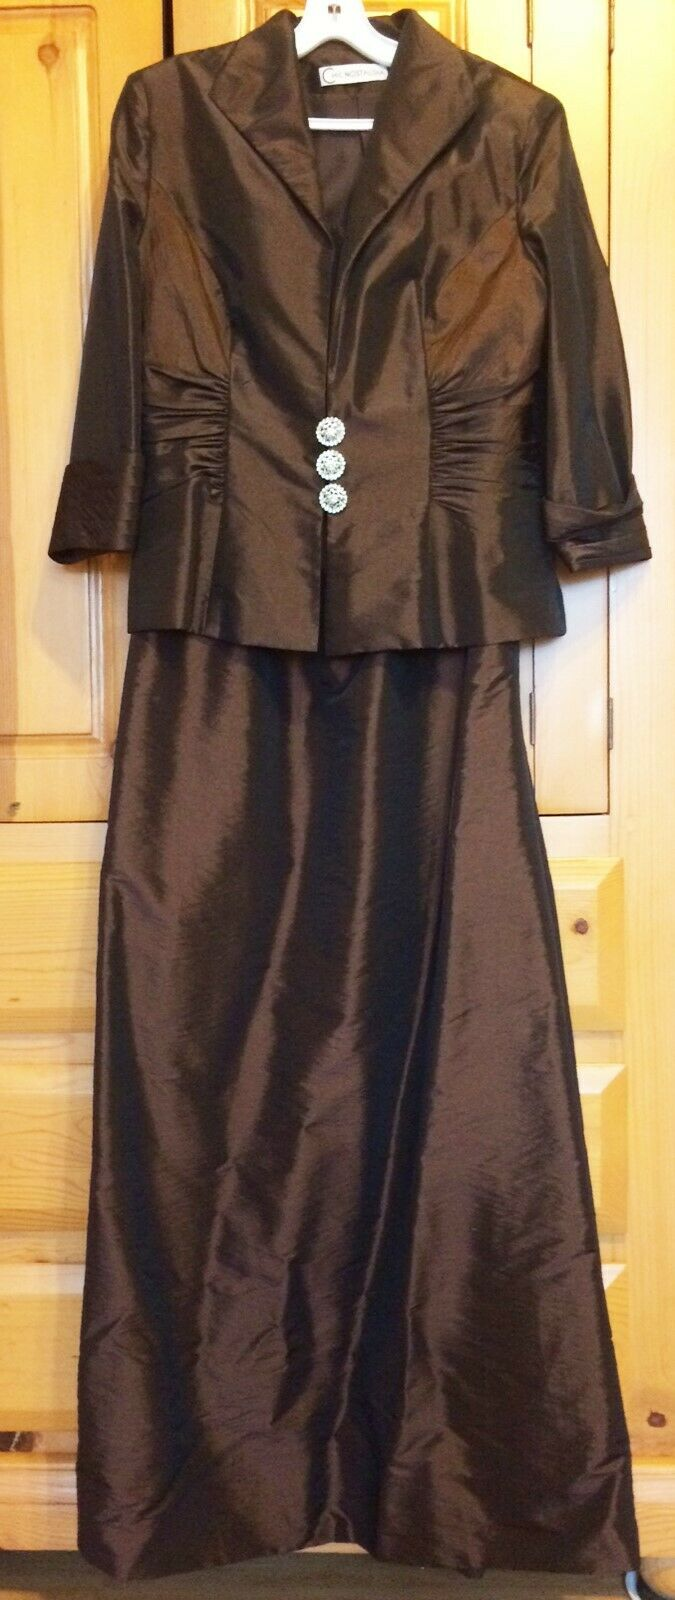 Mother of Bride Dress Suit Jacket Formal A-Line Taffeta 3/4 Sleeves Brown 12, 10